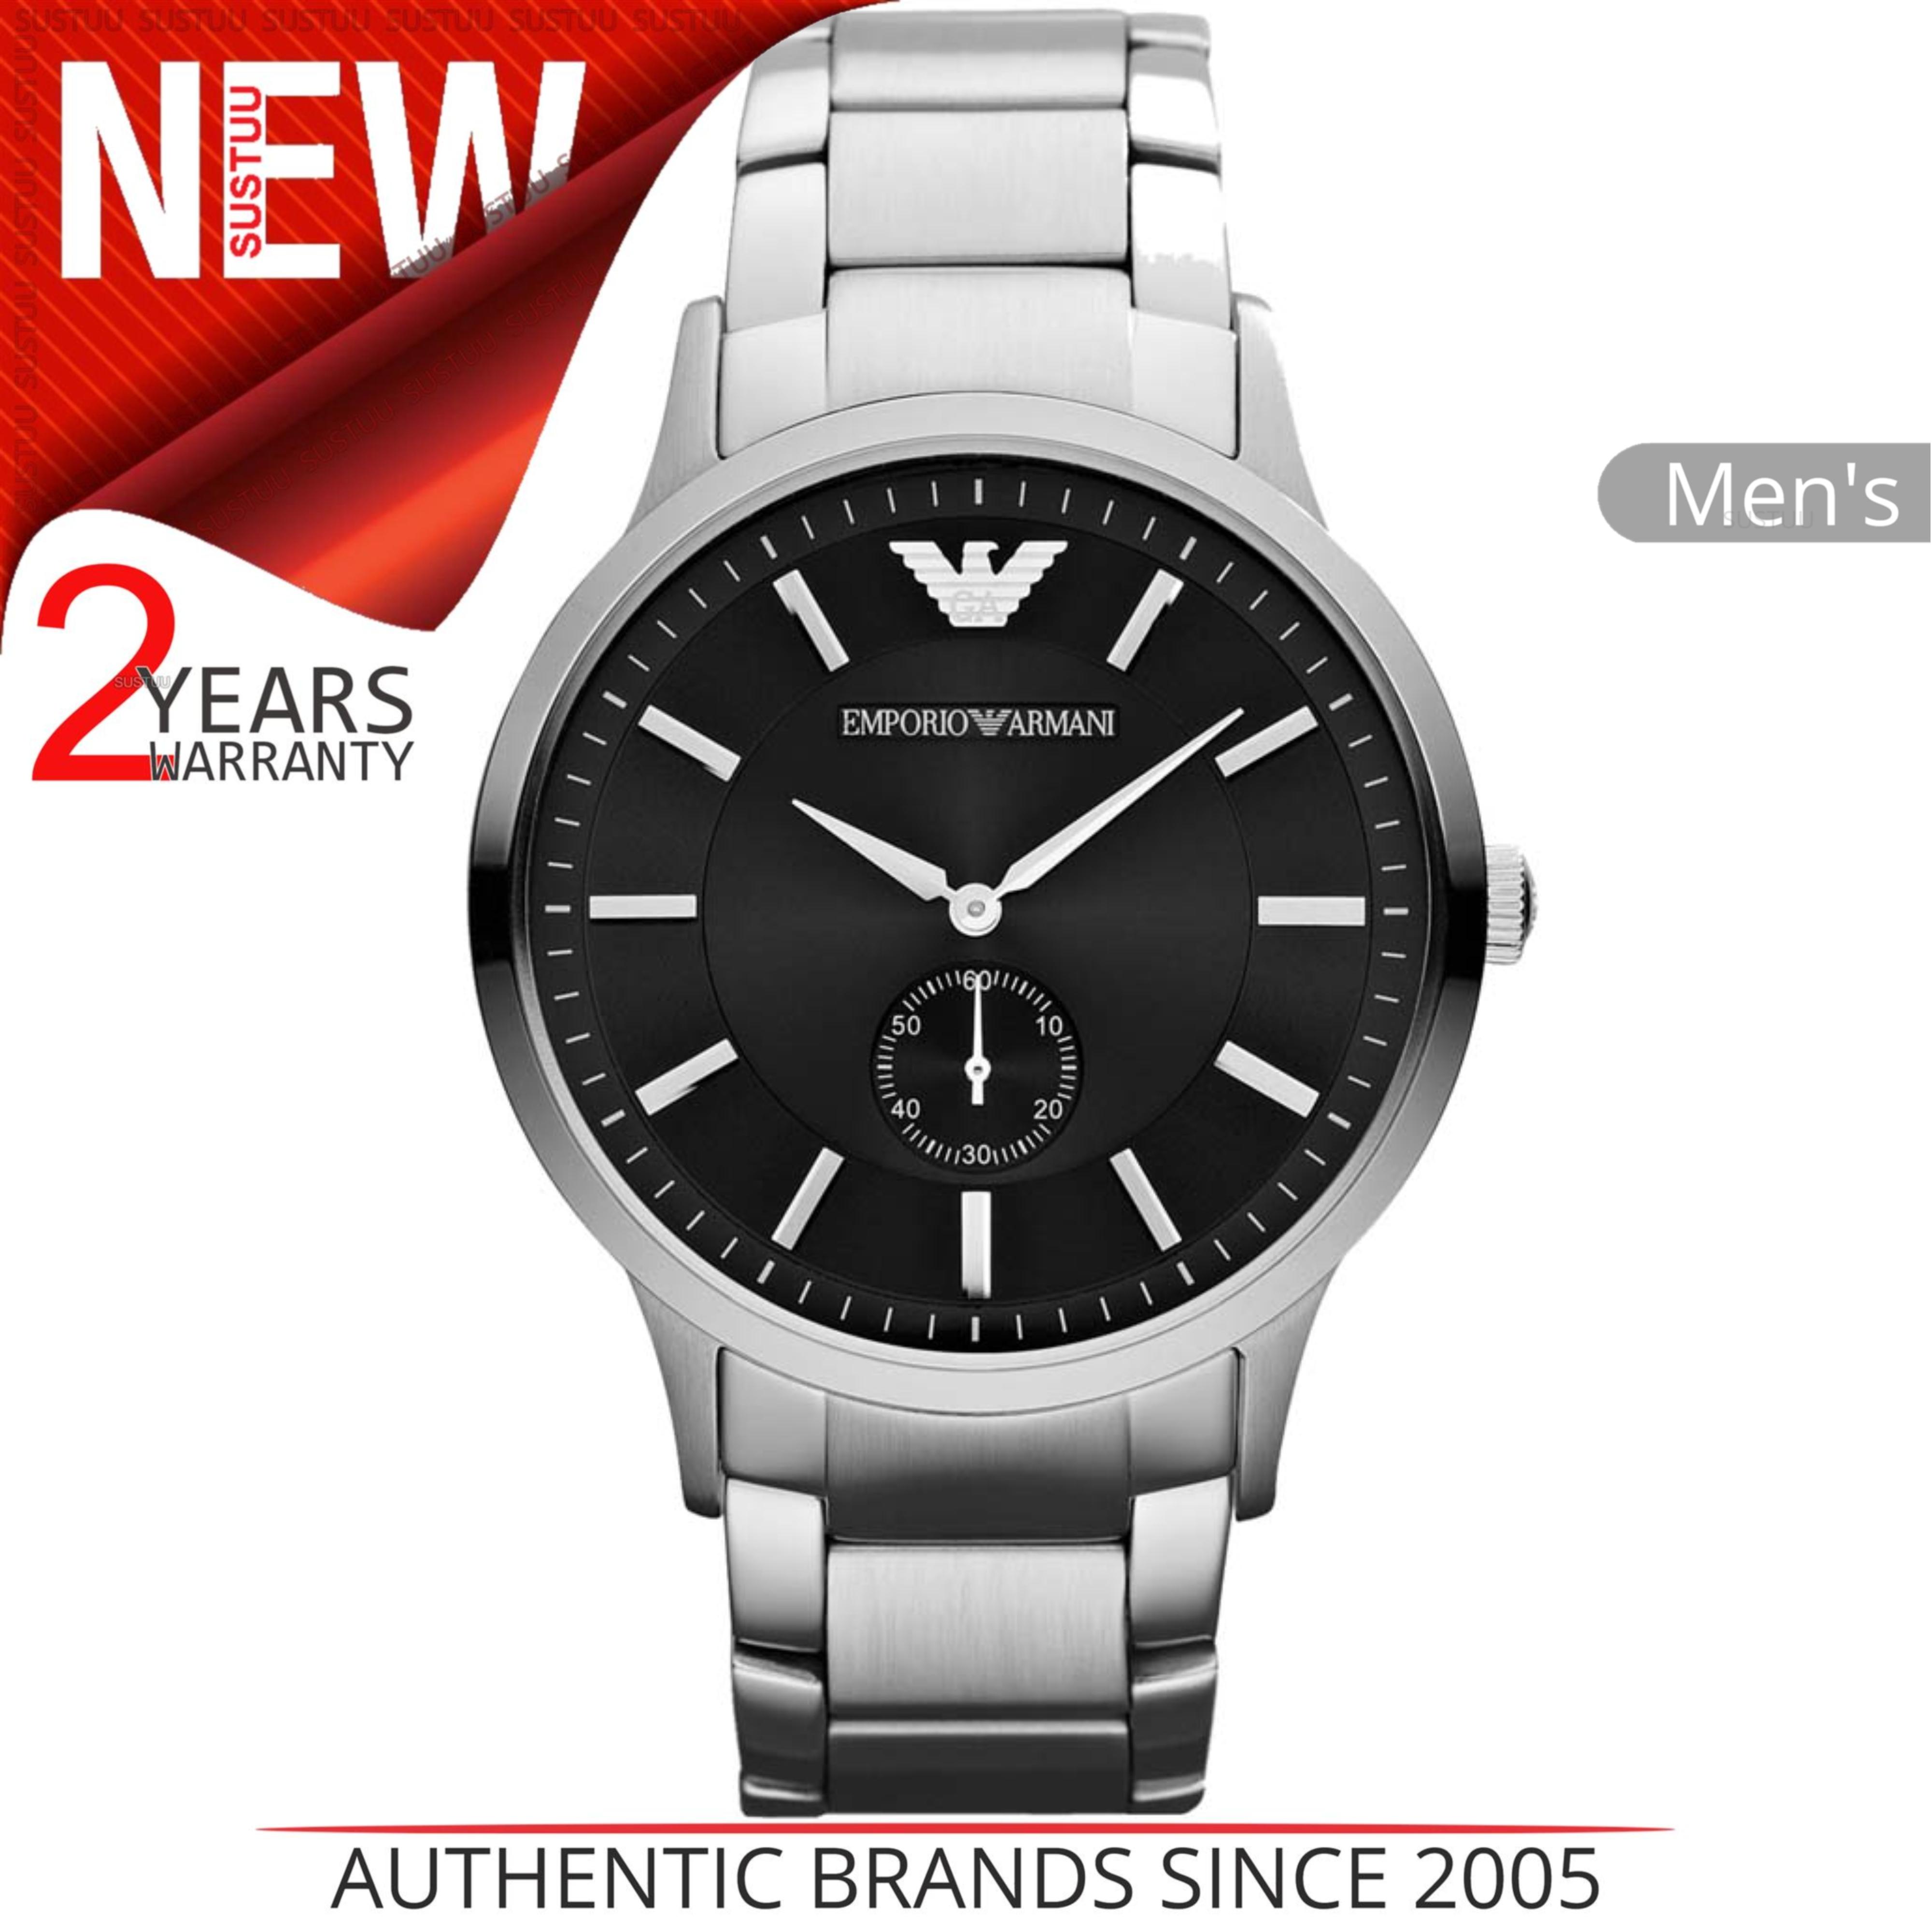 c47861de8f47 Sentinel Emporio Armani Men s Formal Watch AR9107│Round Black Dial│Silver  Tone Bracelet. Sentinel Thumbnail 2